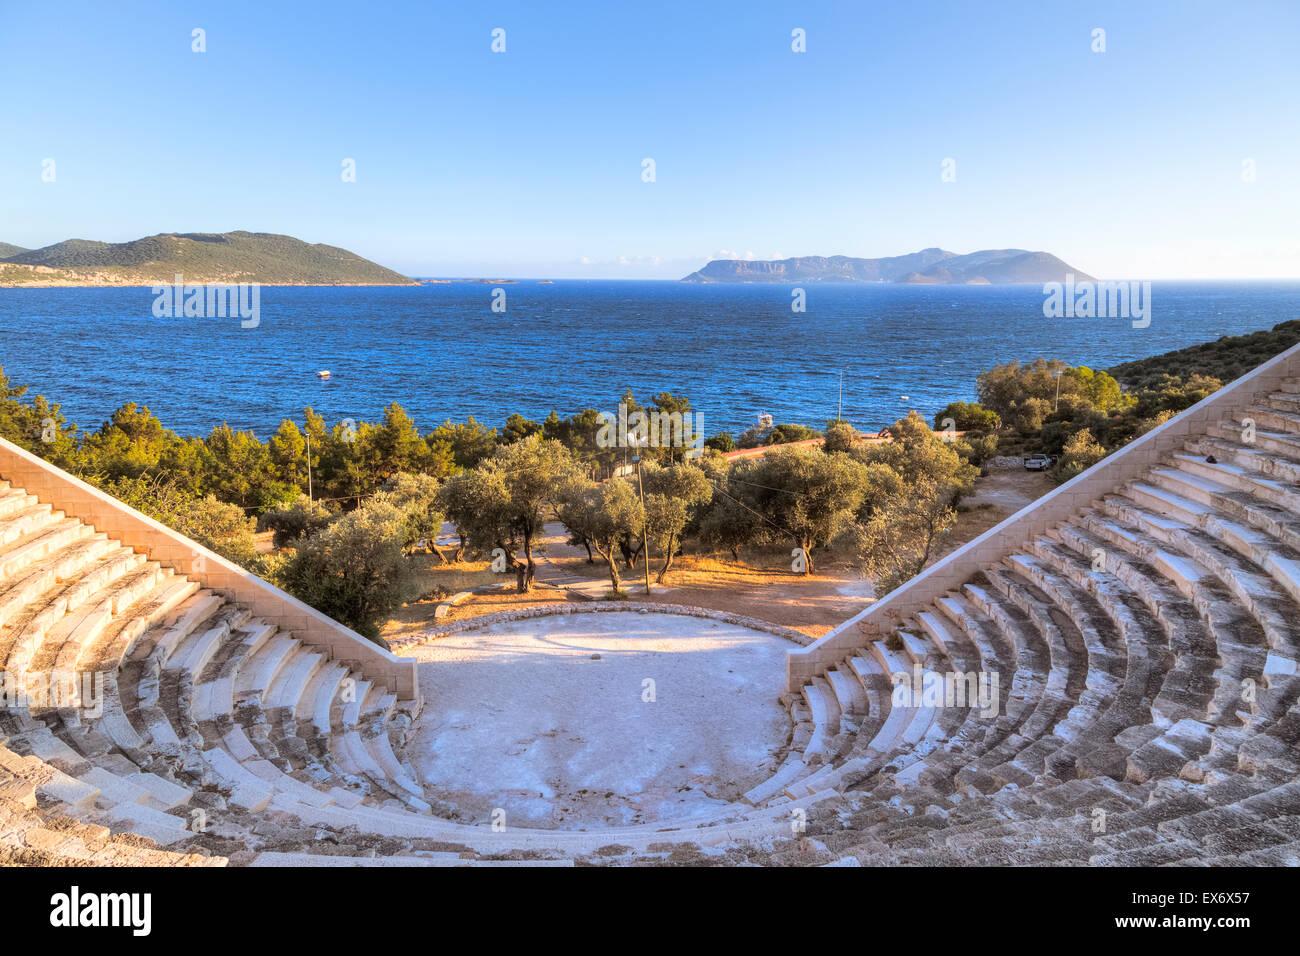 Kas, Antalya, Mediterranean, Turkey - Stock Image